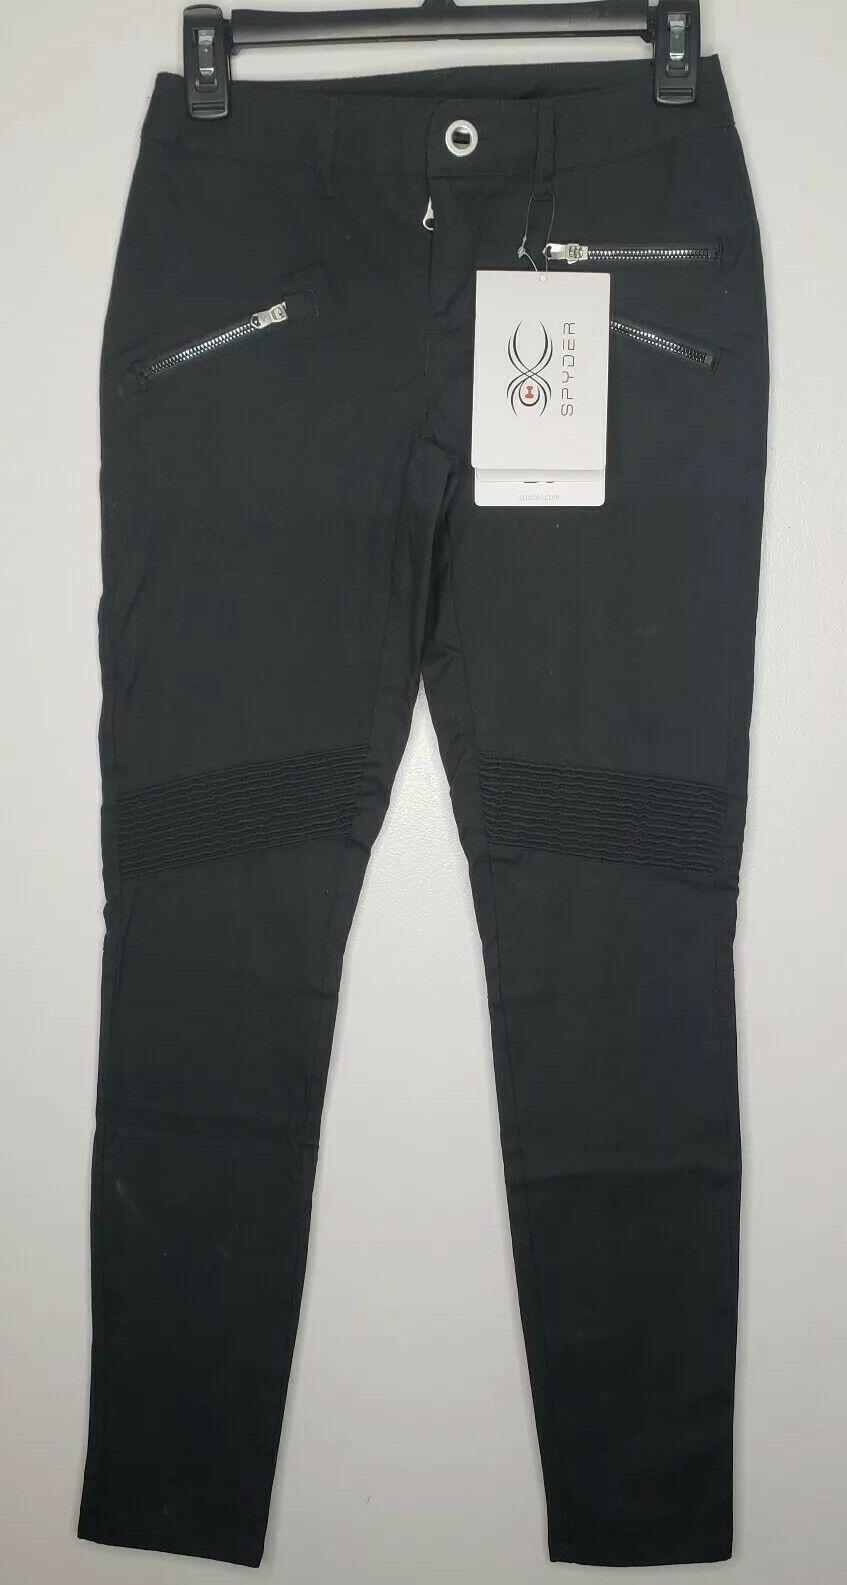 Sexy modern Spyder brand women's pants NWT Hyde Pant  size 2 BLK MSRP